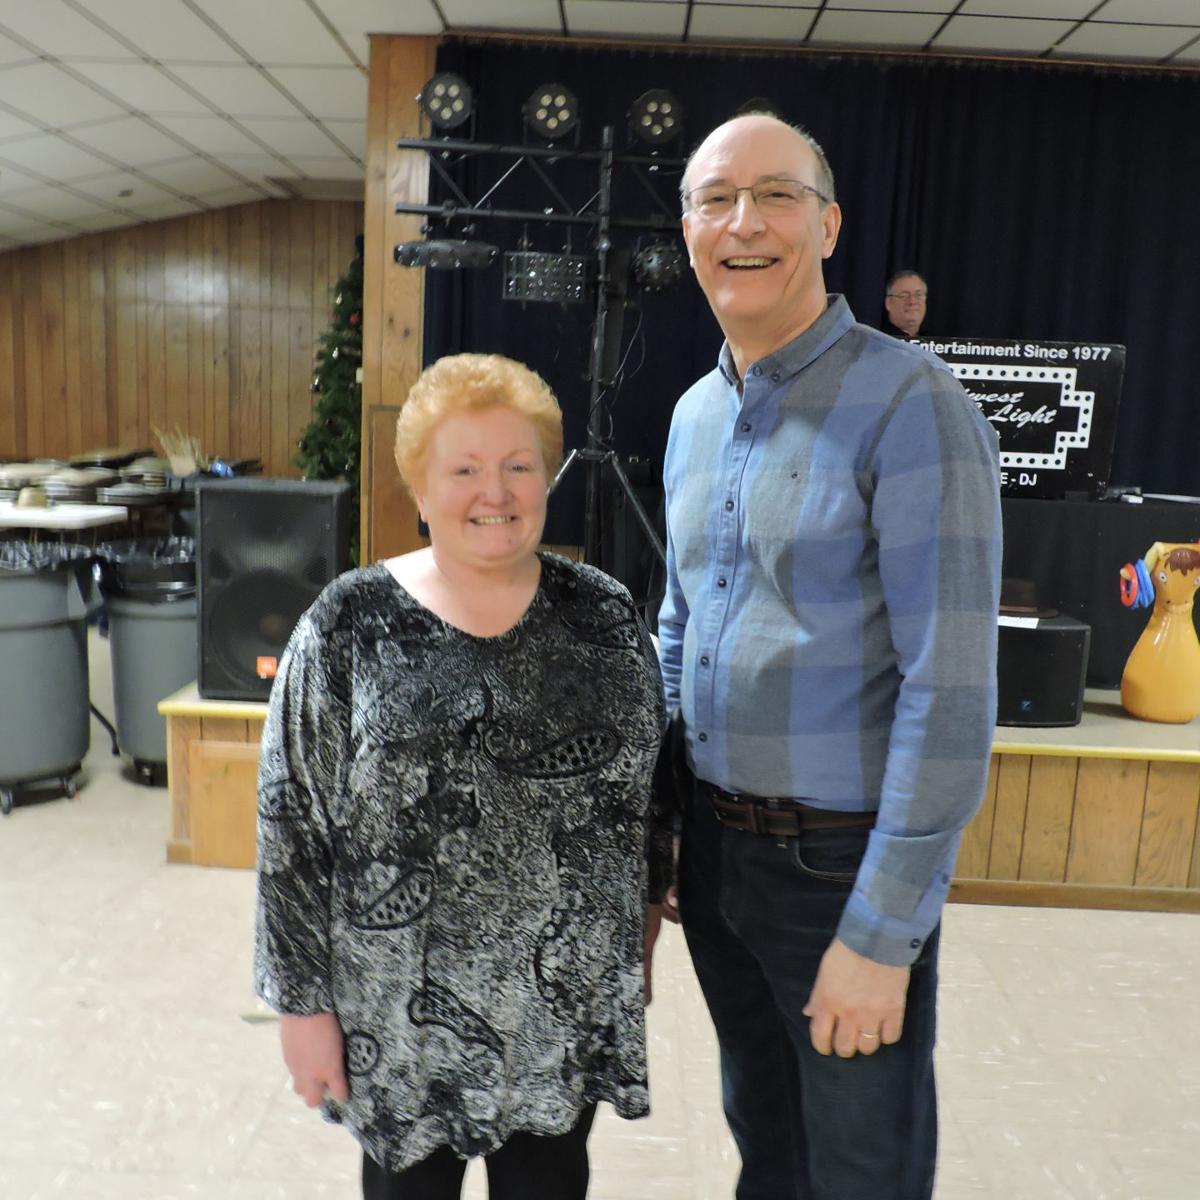 Pinckneyville honorees